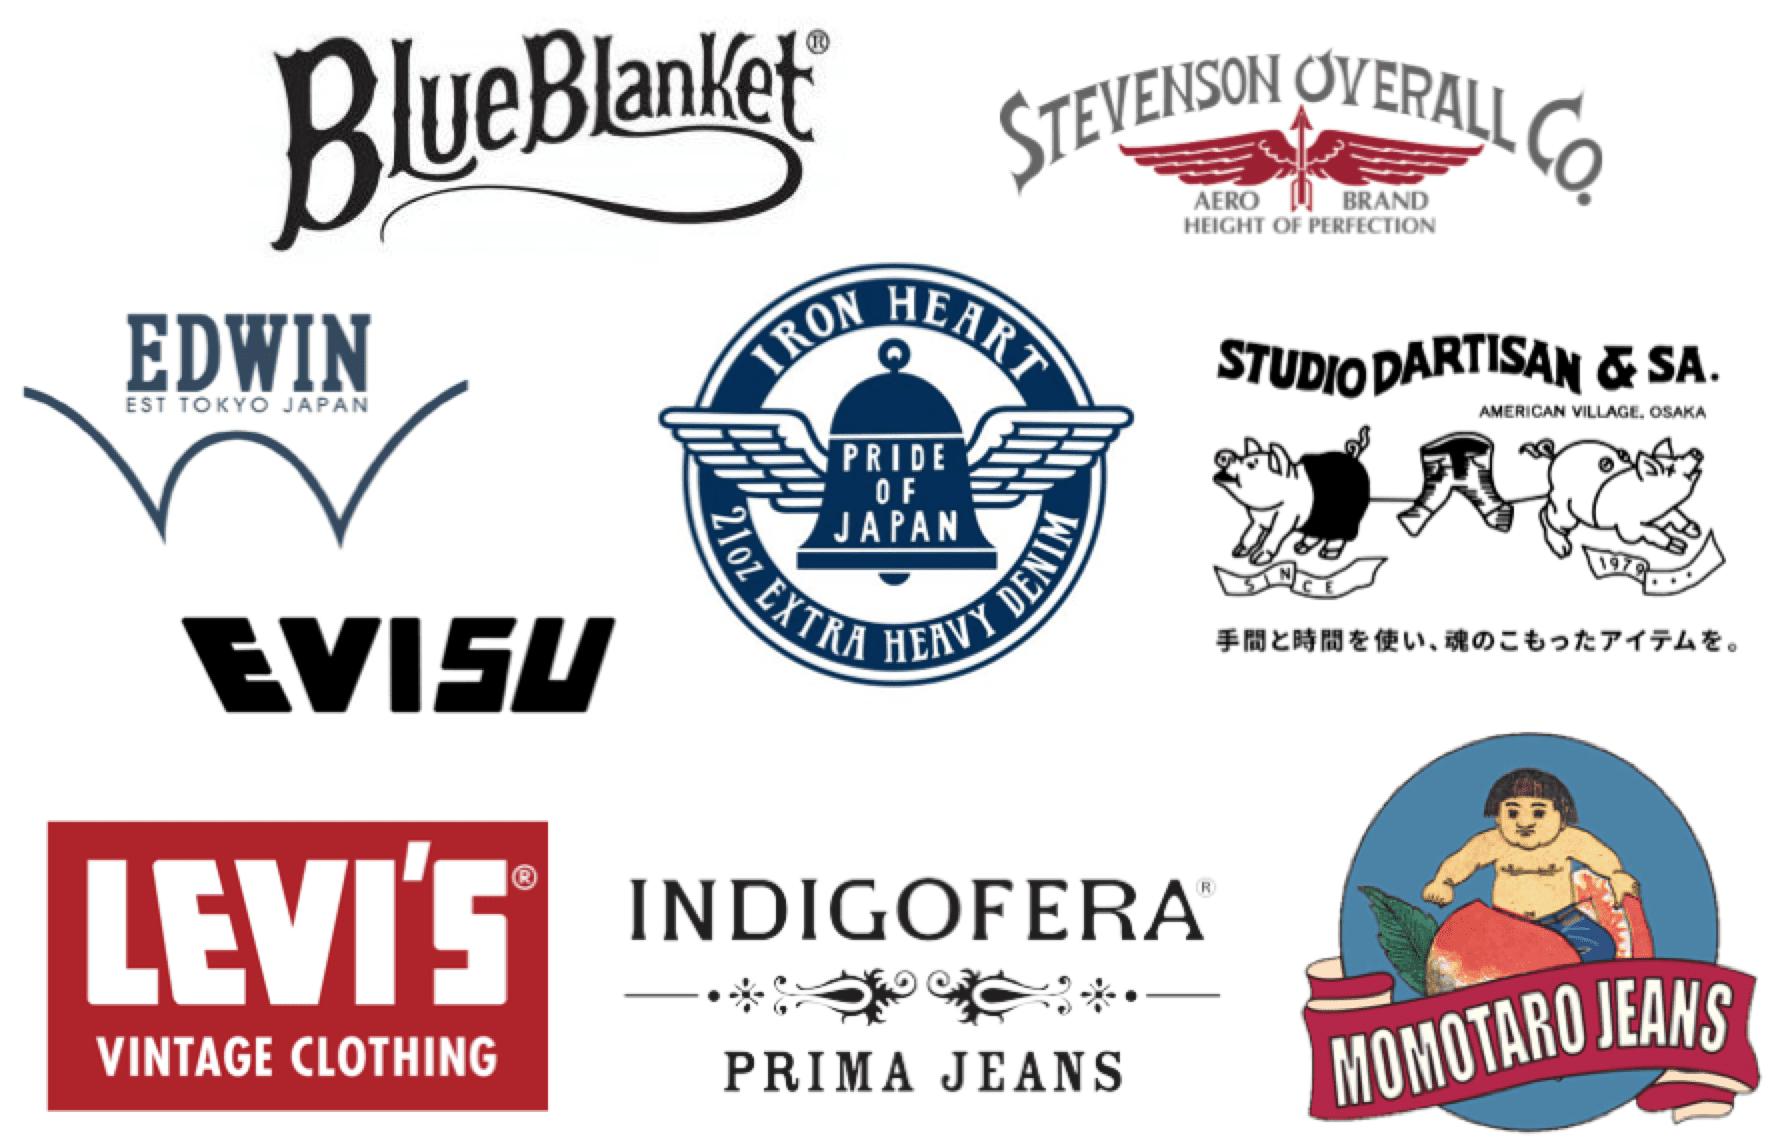 Heritage jeans - Blue Blanket, Stevenson Overalls, Edwin Jeans, Iron Heart, Studio D'Artisan, Evisu, Momotaro, Indigofera, Levi's Vintage Clothing